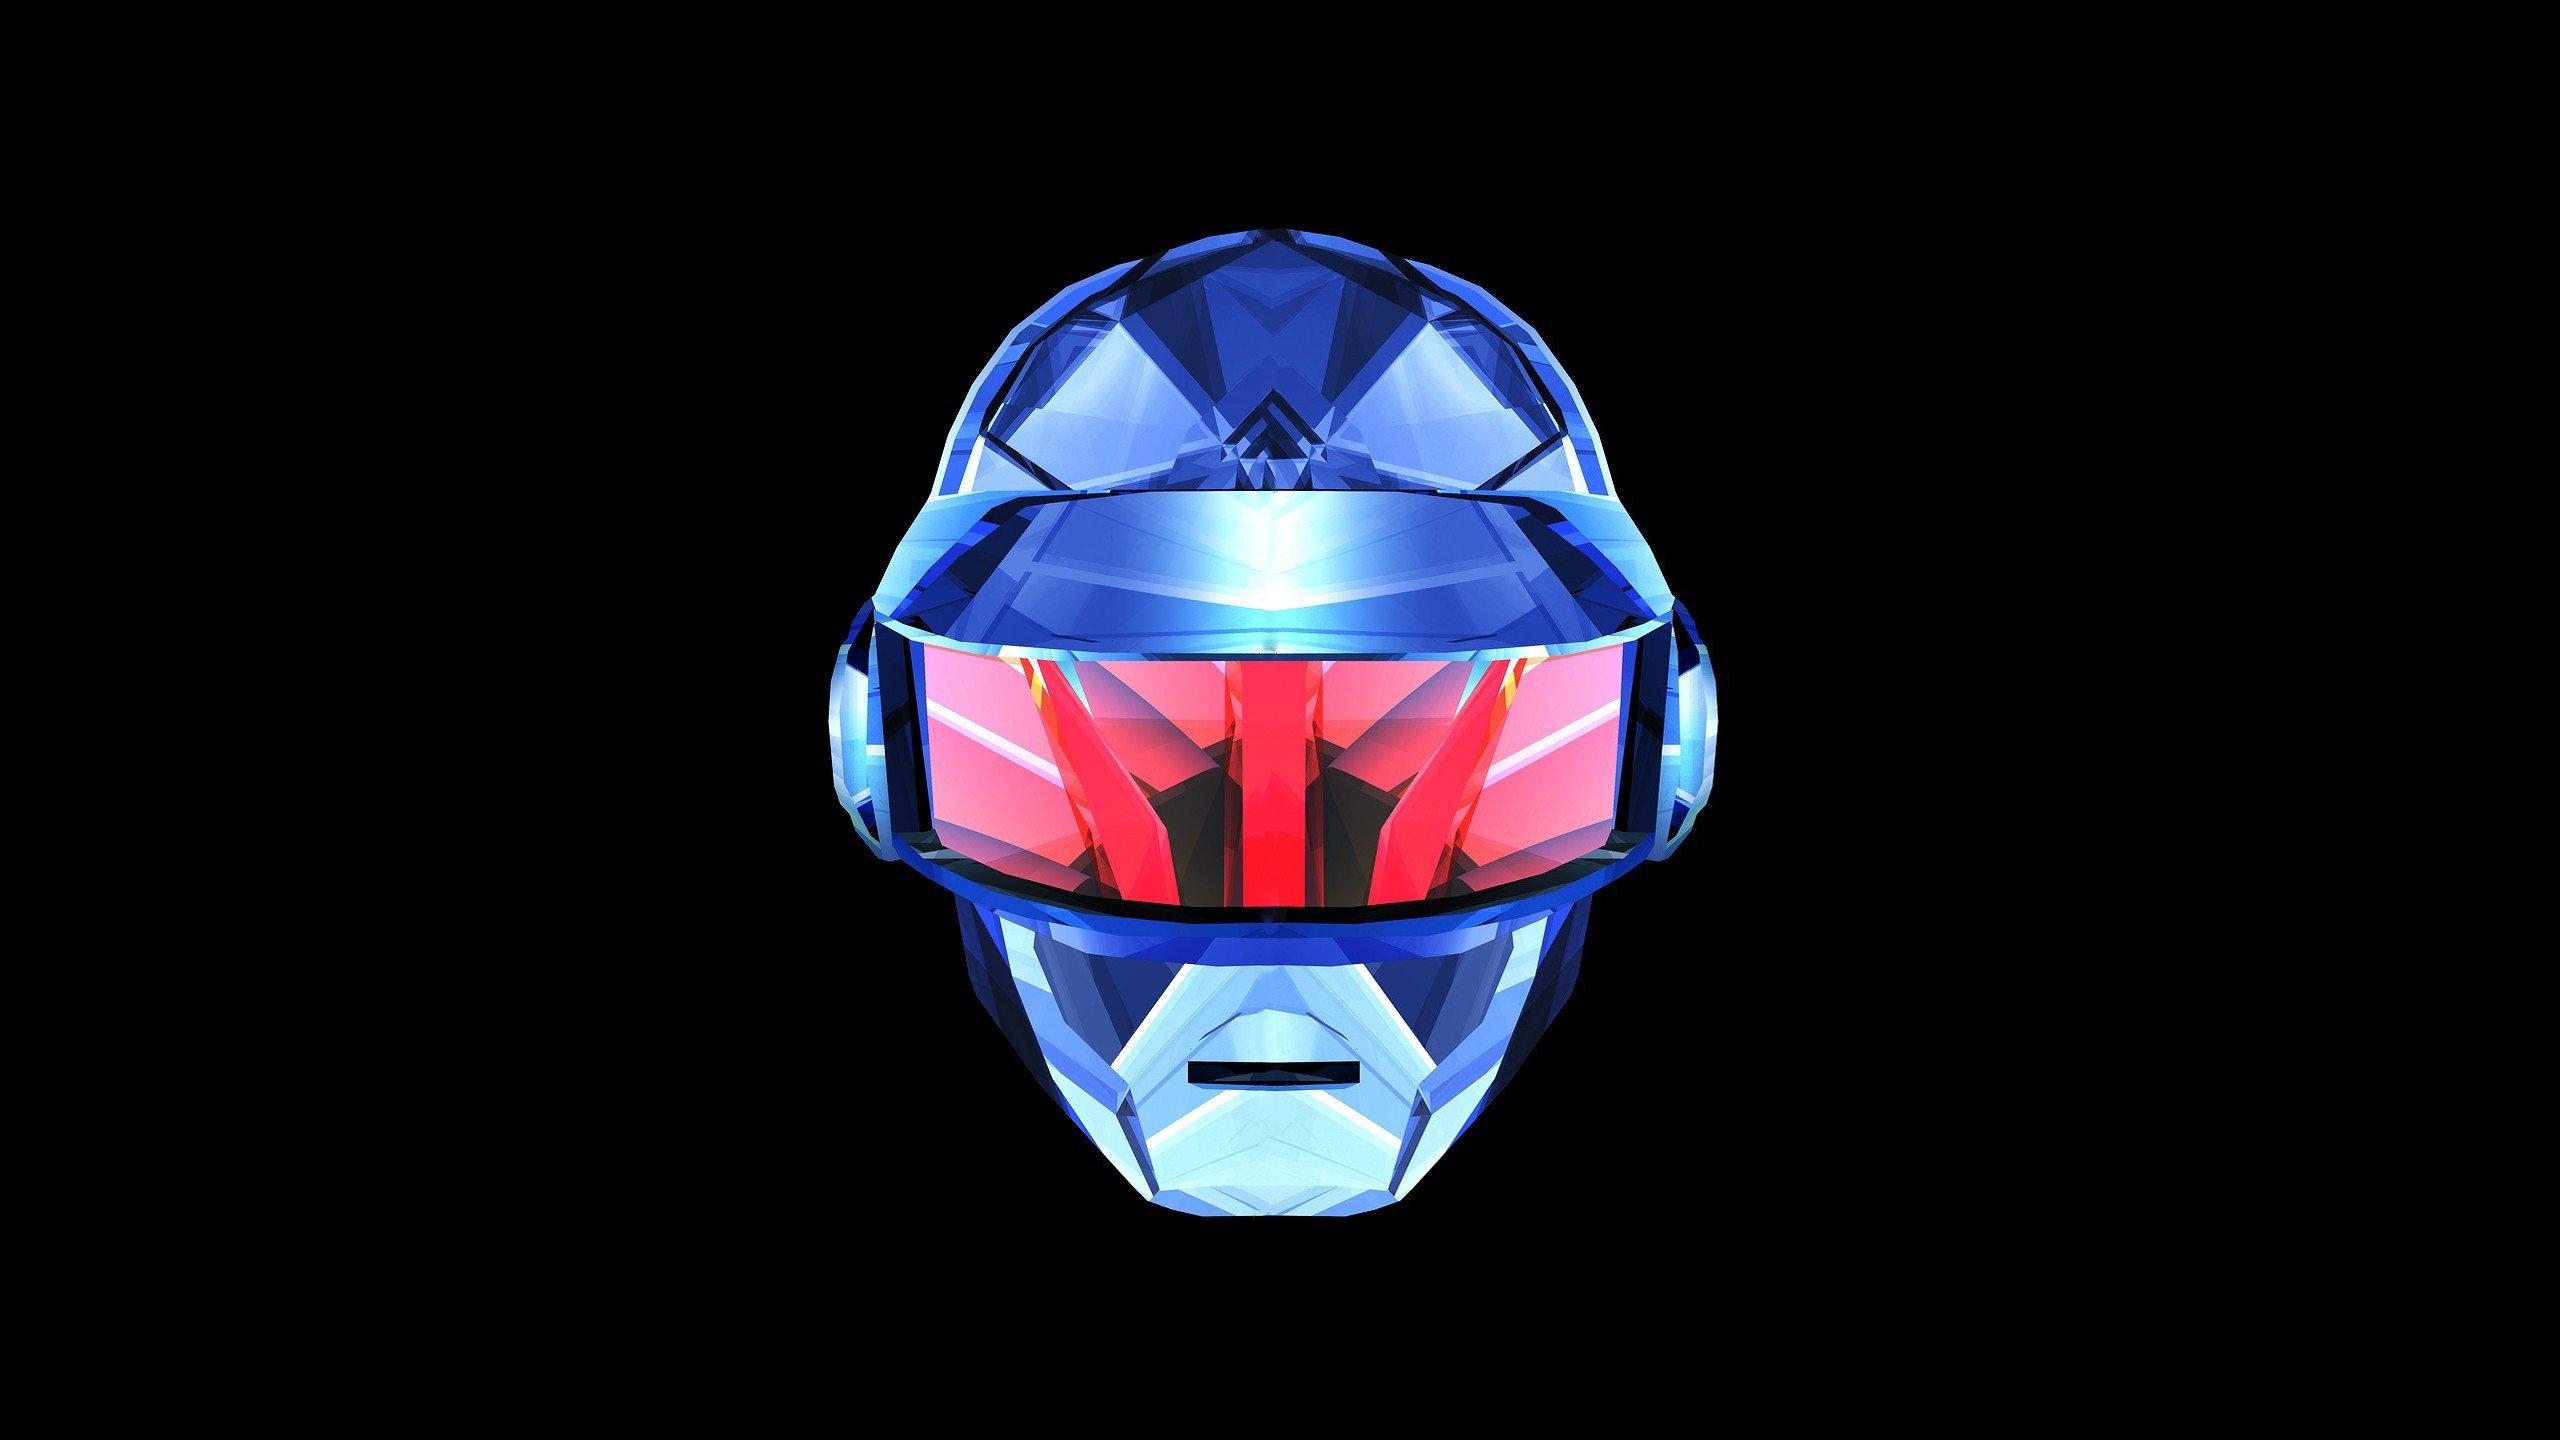 2560x1440 Px Black Daft Punk Music Pink Silver